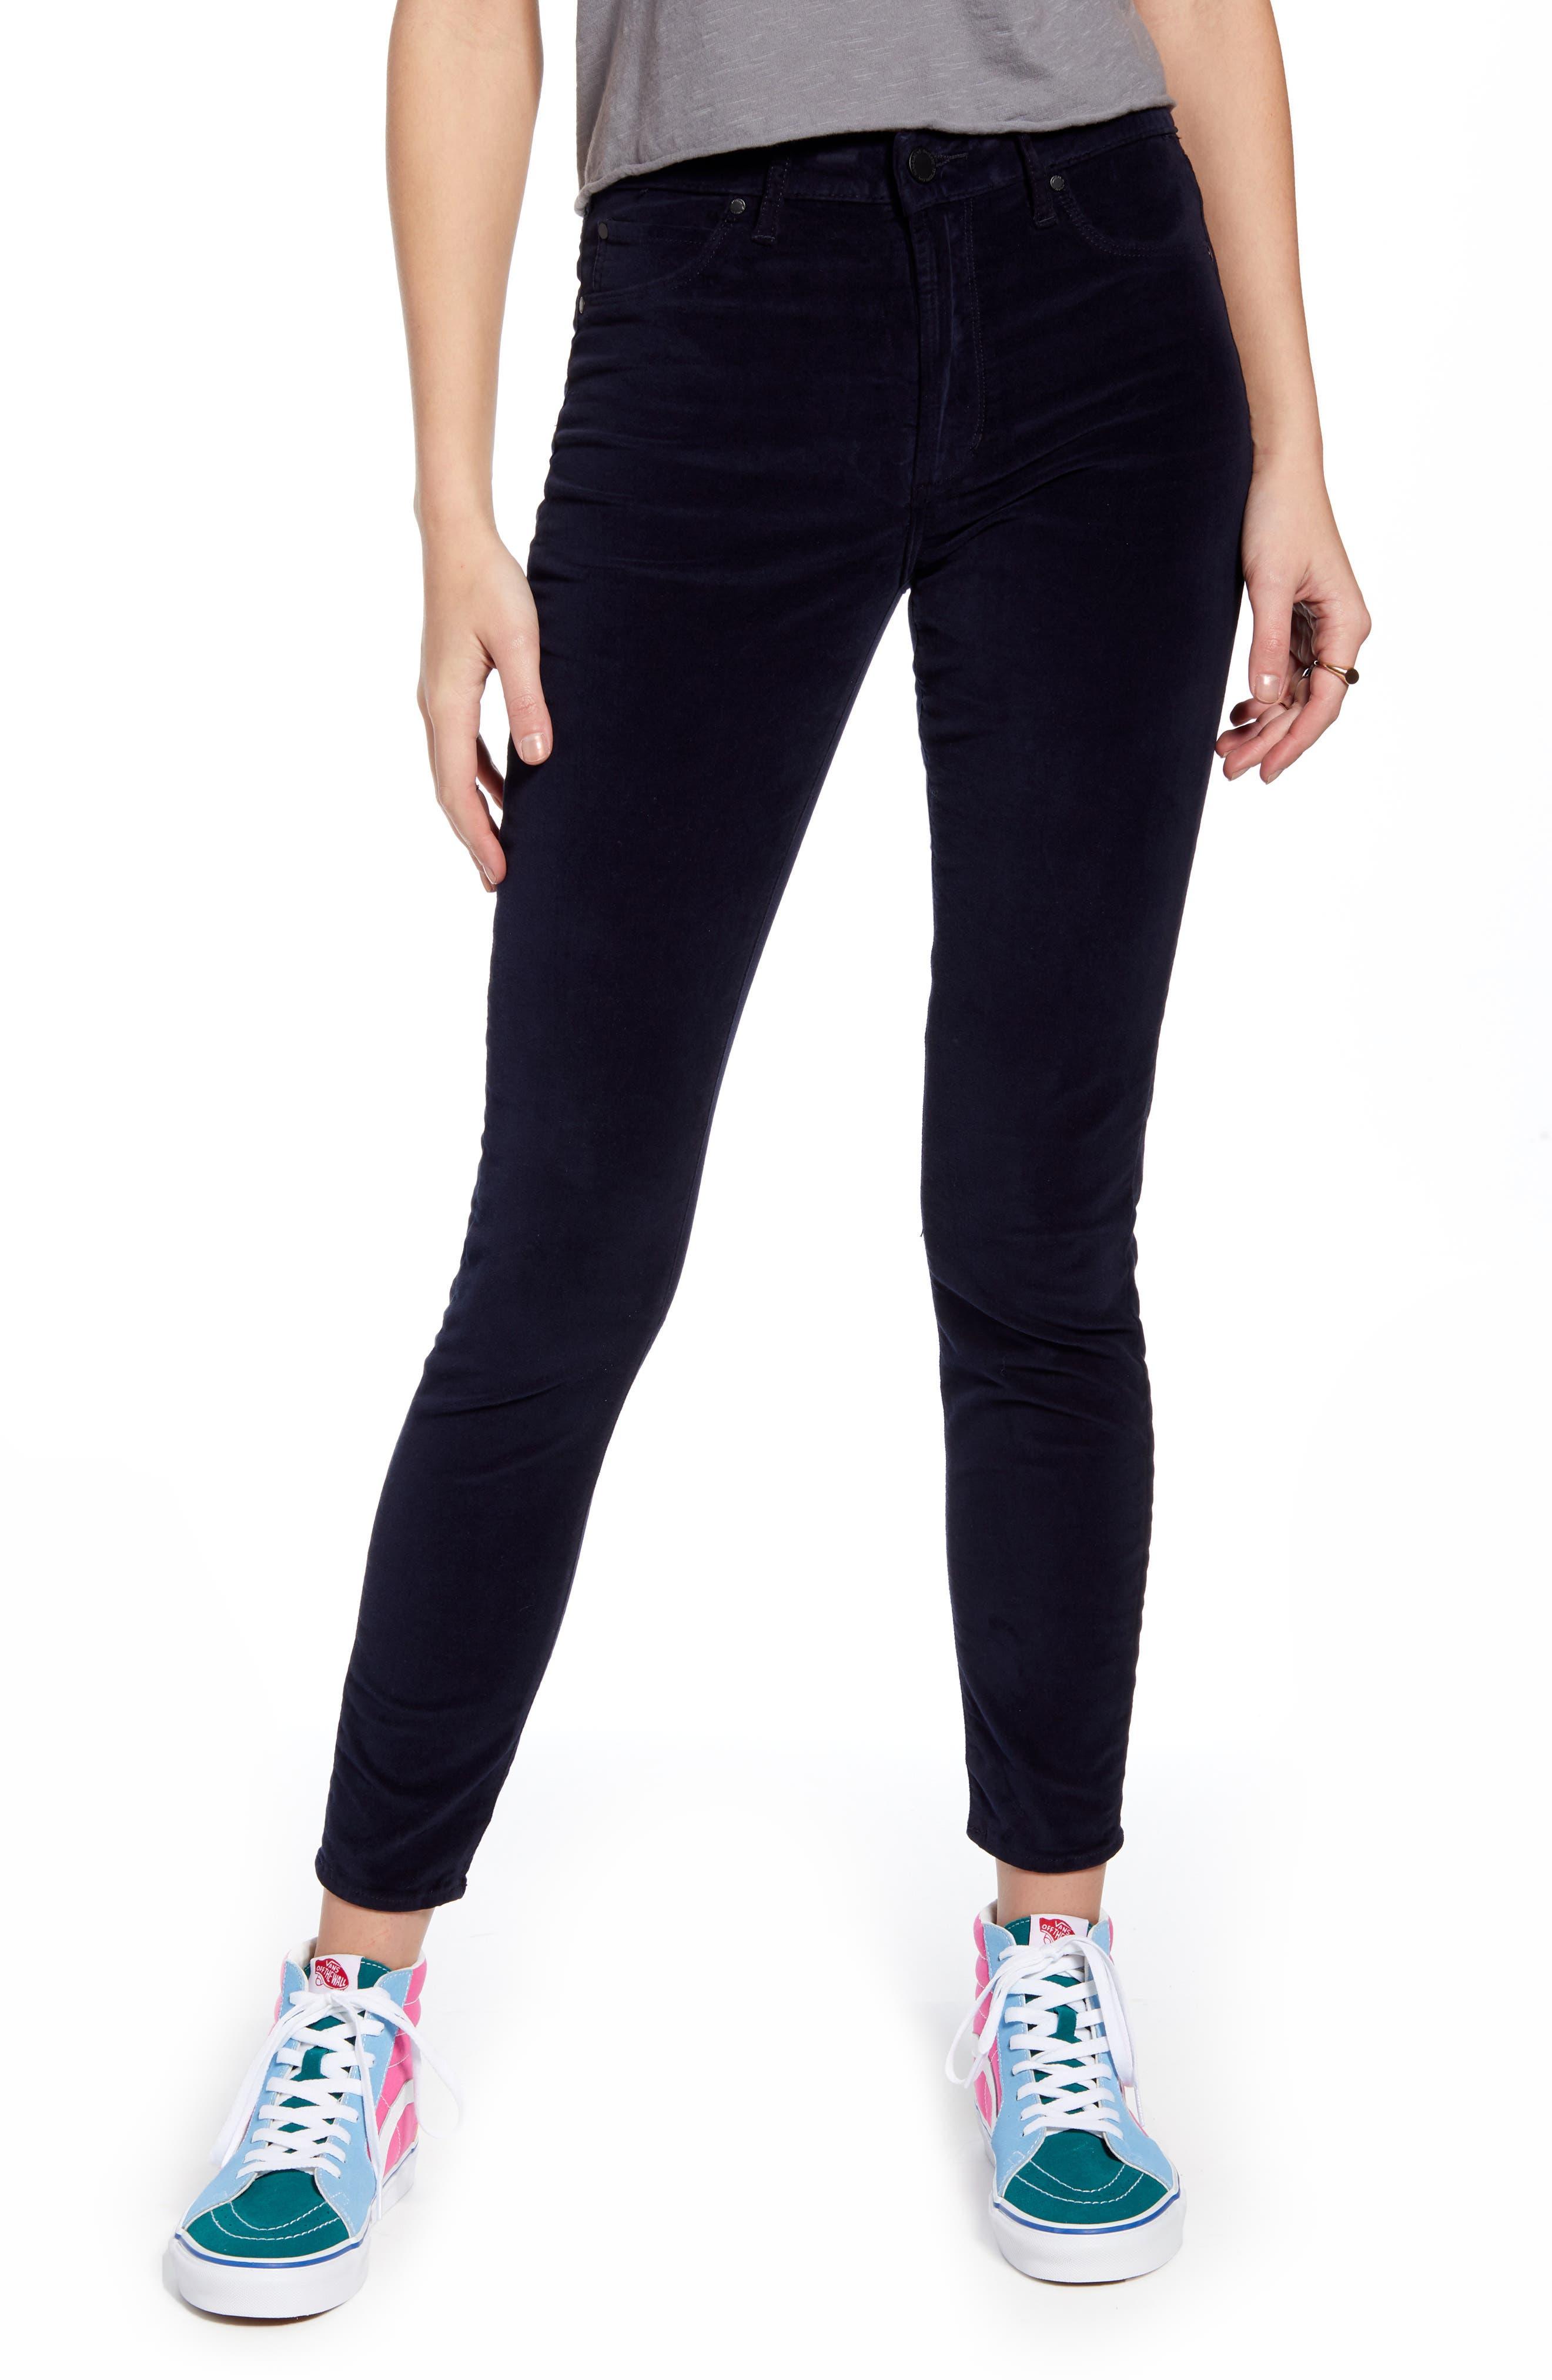 Image of Articles of Society Hilary High Rise Skinny Velveteen Pants